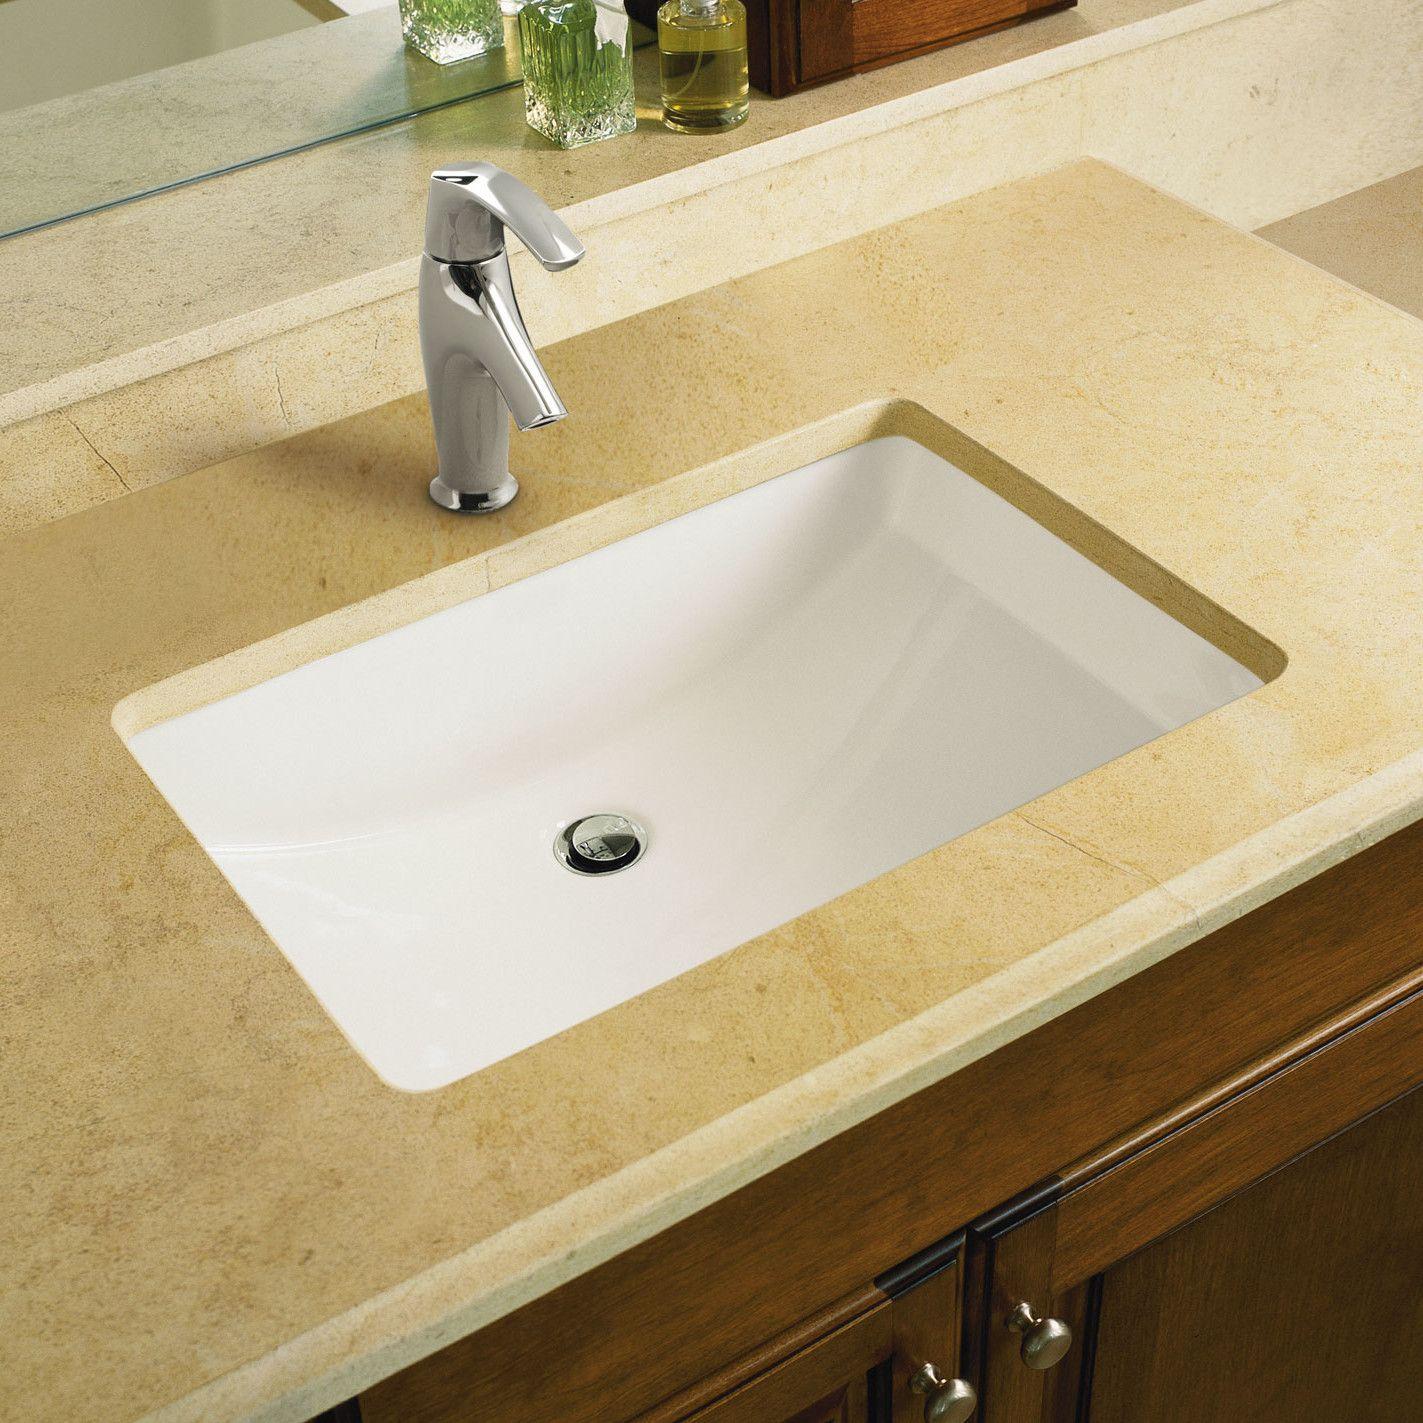 Kohler Ladena Undermount Bathroom Sink With Overflow White Fixture Lavatory  Sink Vitreous China